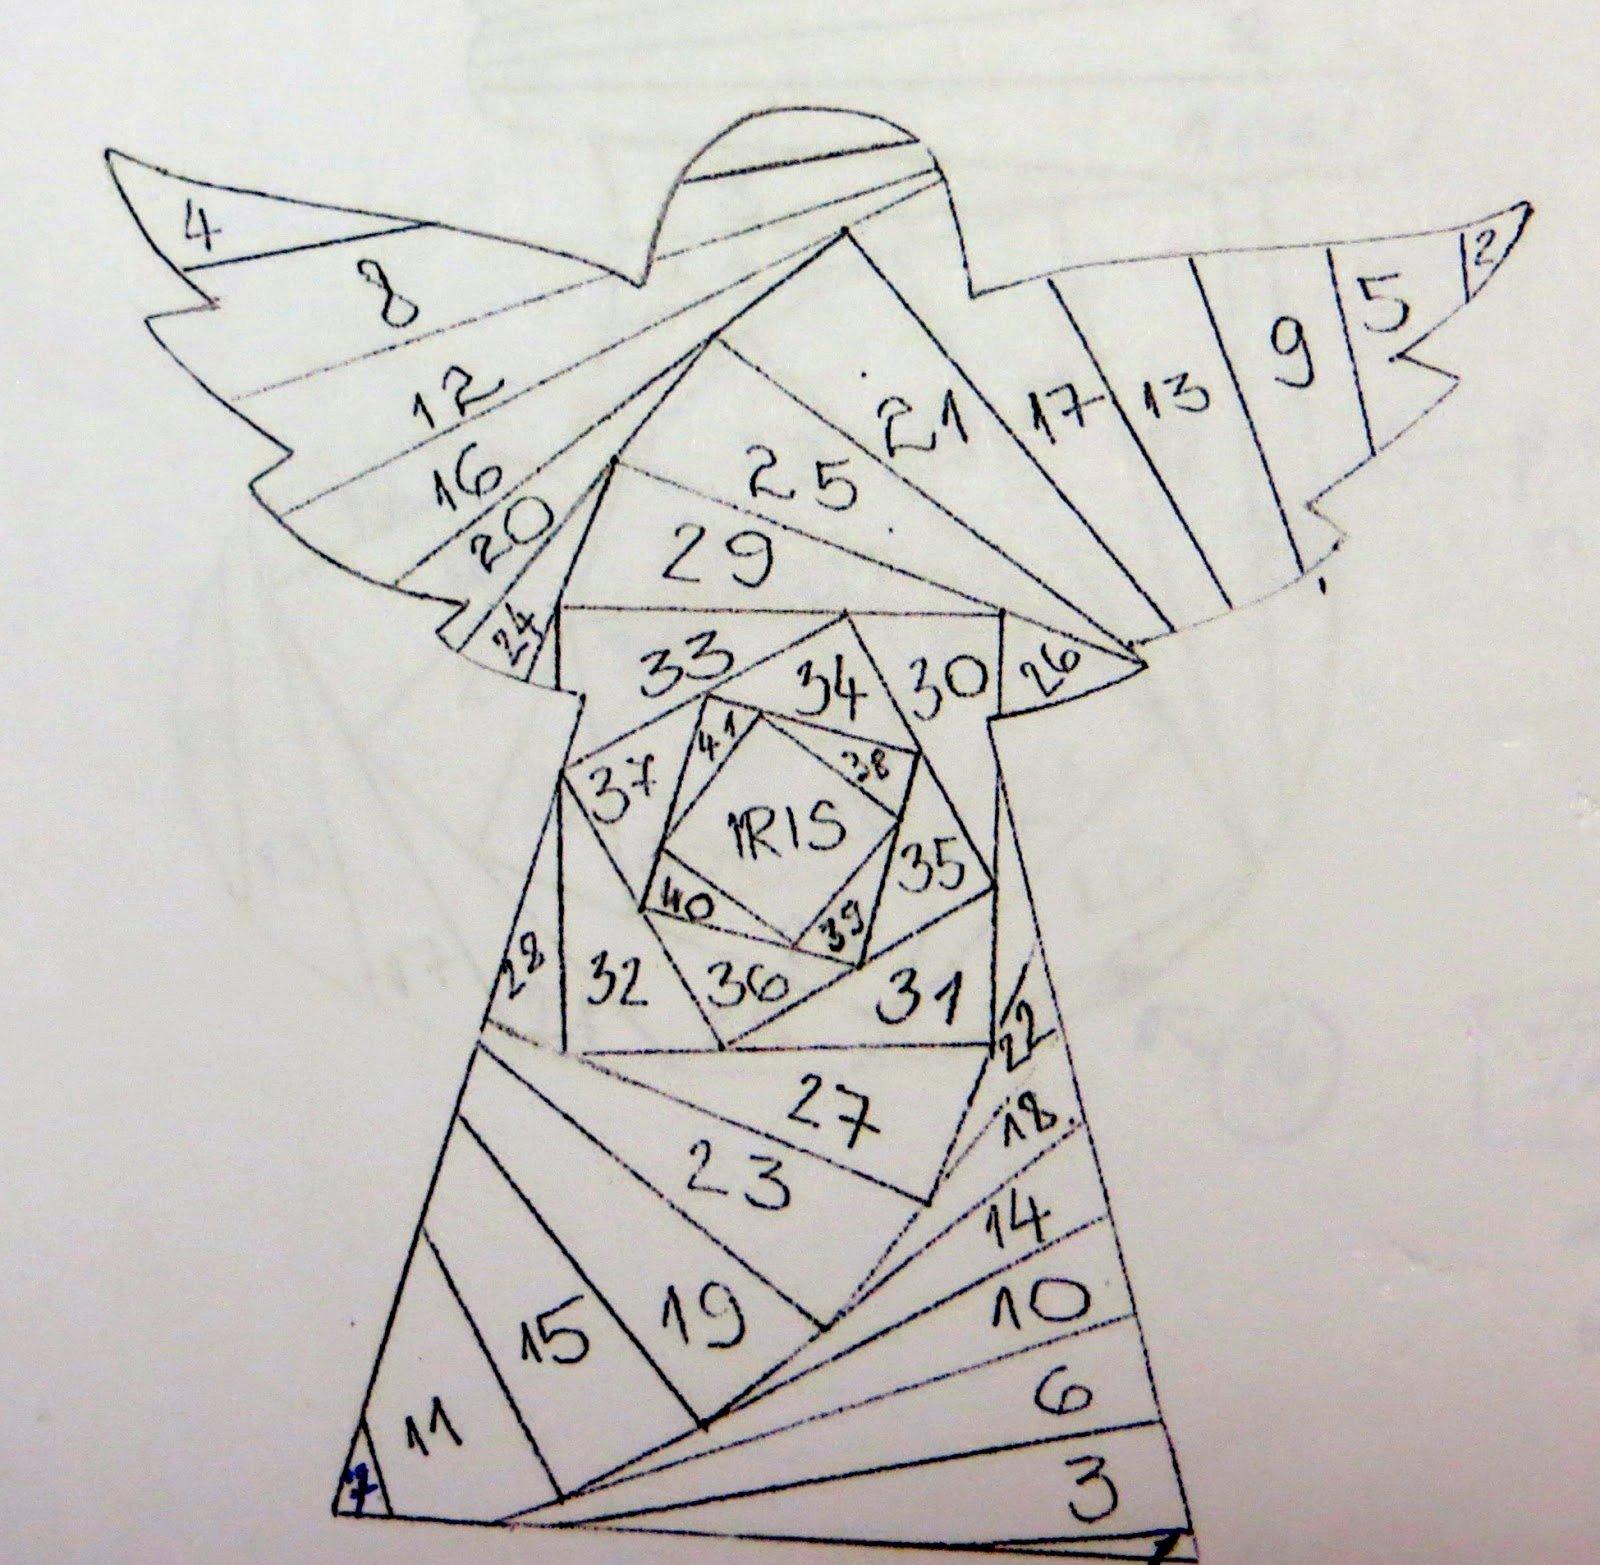 Iris Paper Folding Patterns Inspirational Creative Crafter Iris Folding Instructions Video and Photos